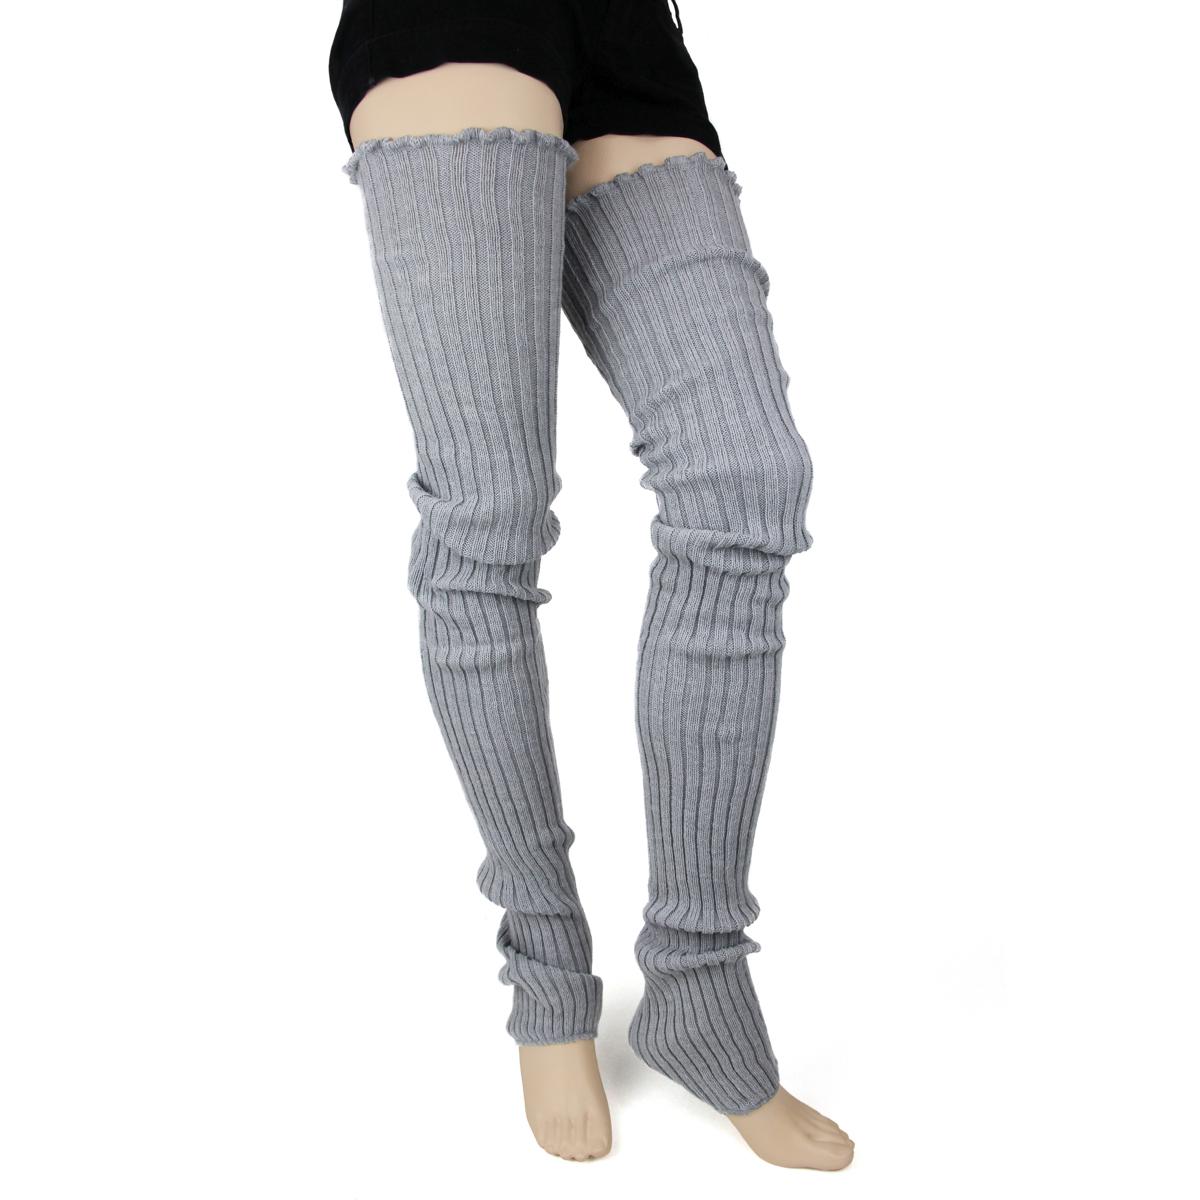 Dance /& Fashion All Cotton Leg Warmers 19 11 Colors